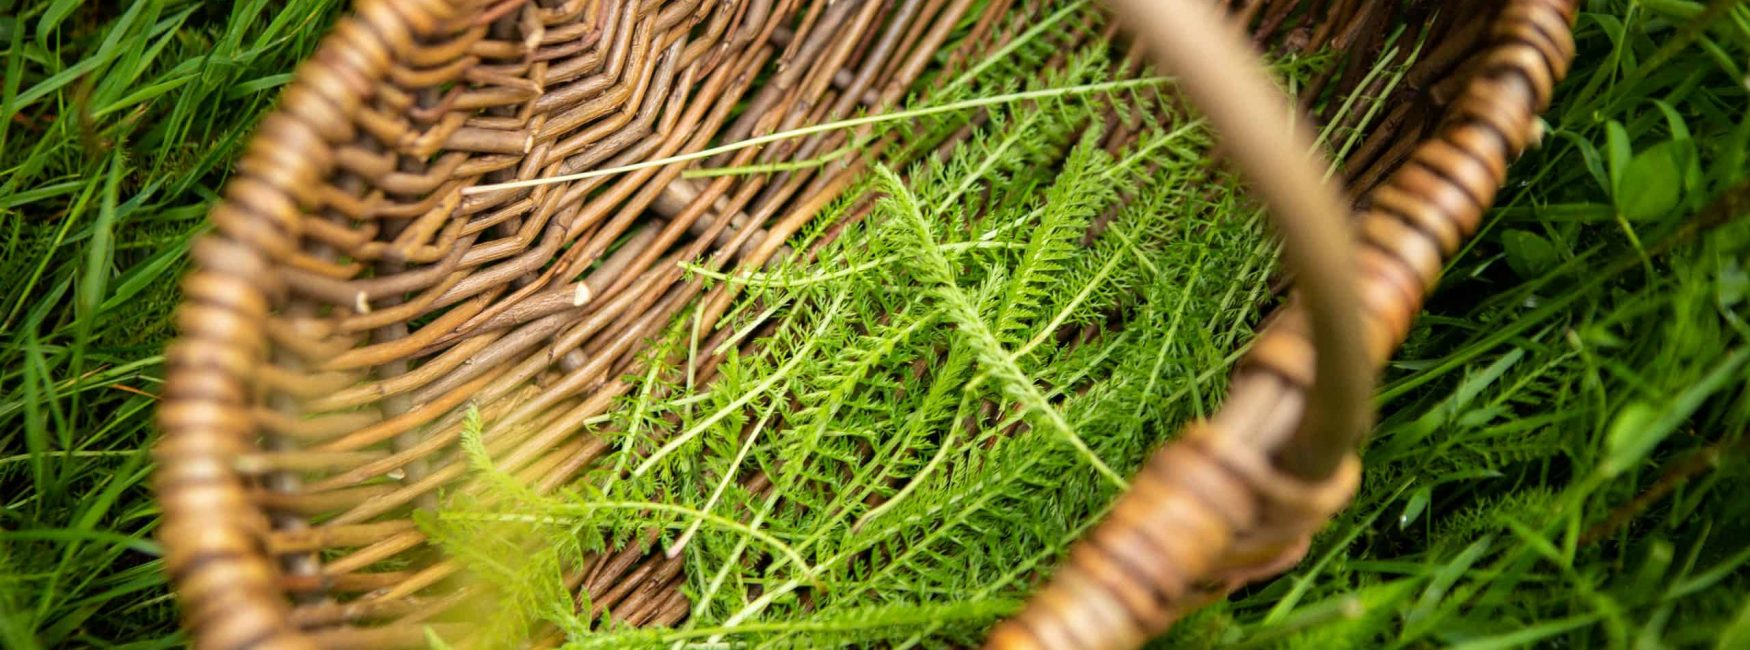 foraging for yarrow, yarrow leaves